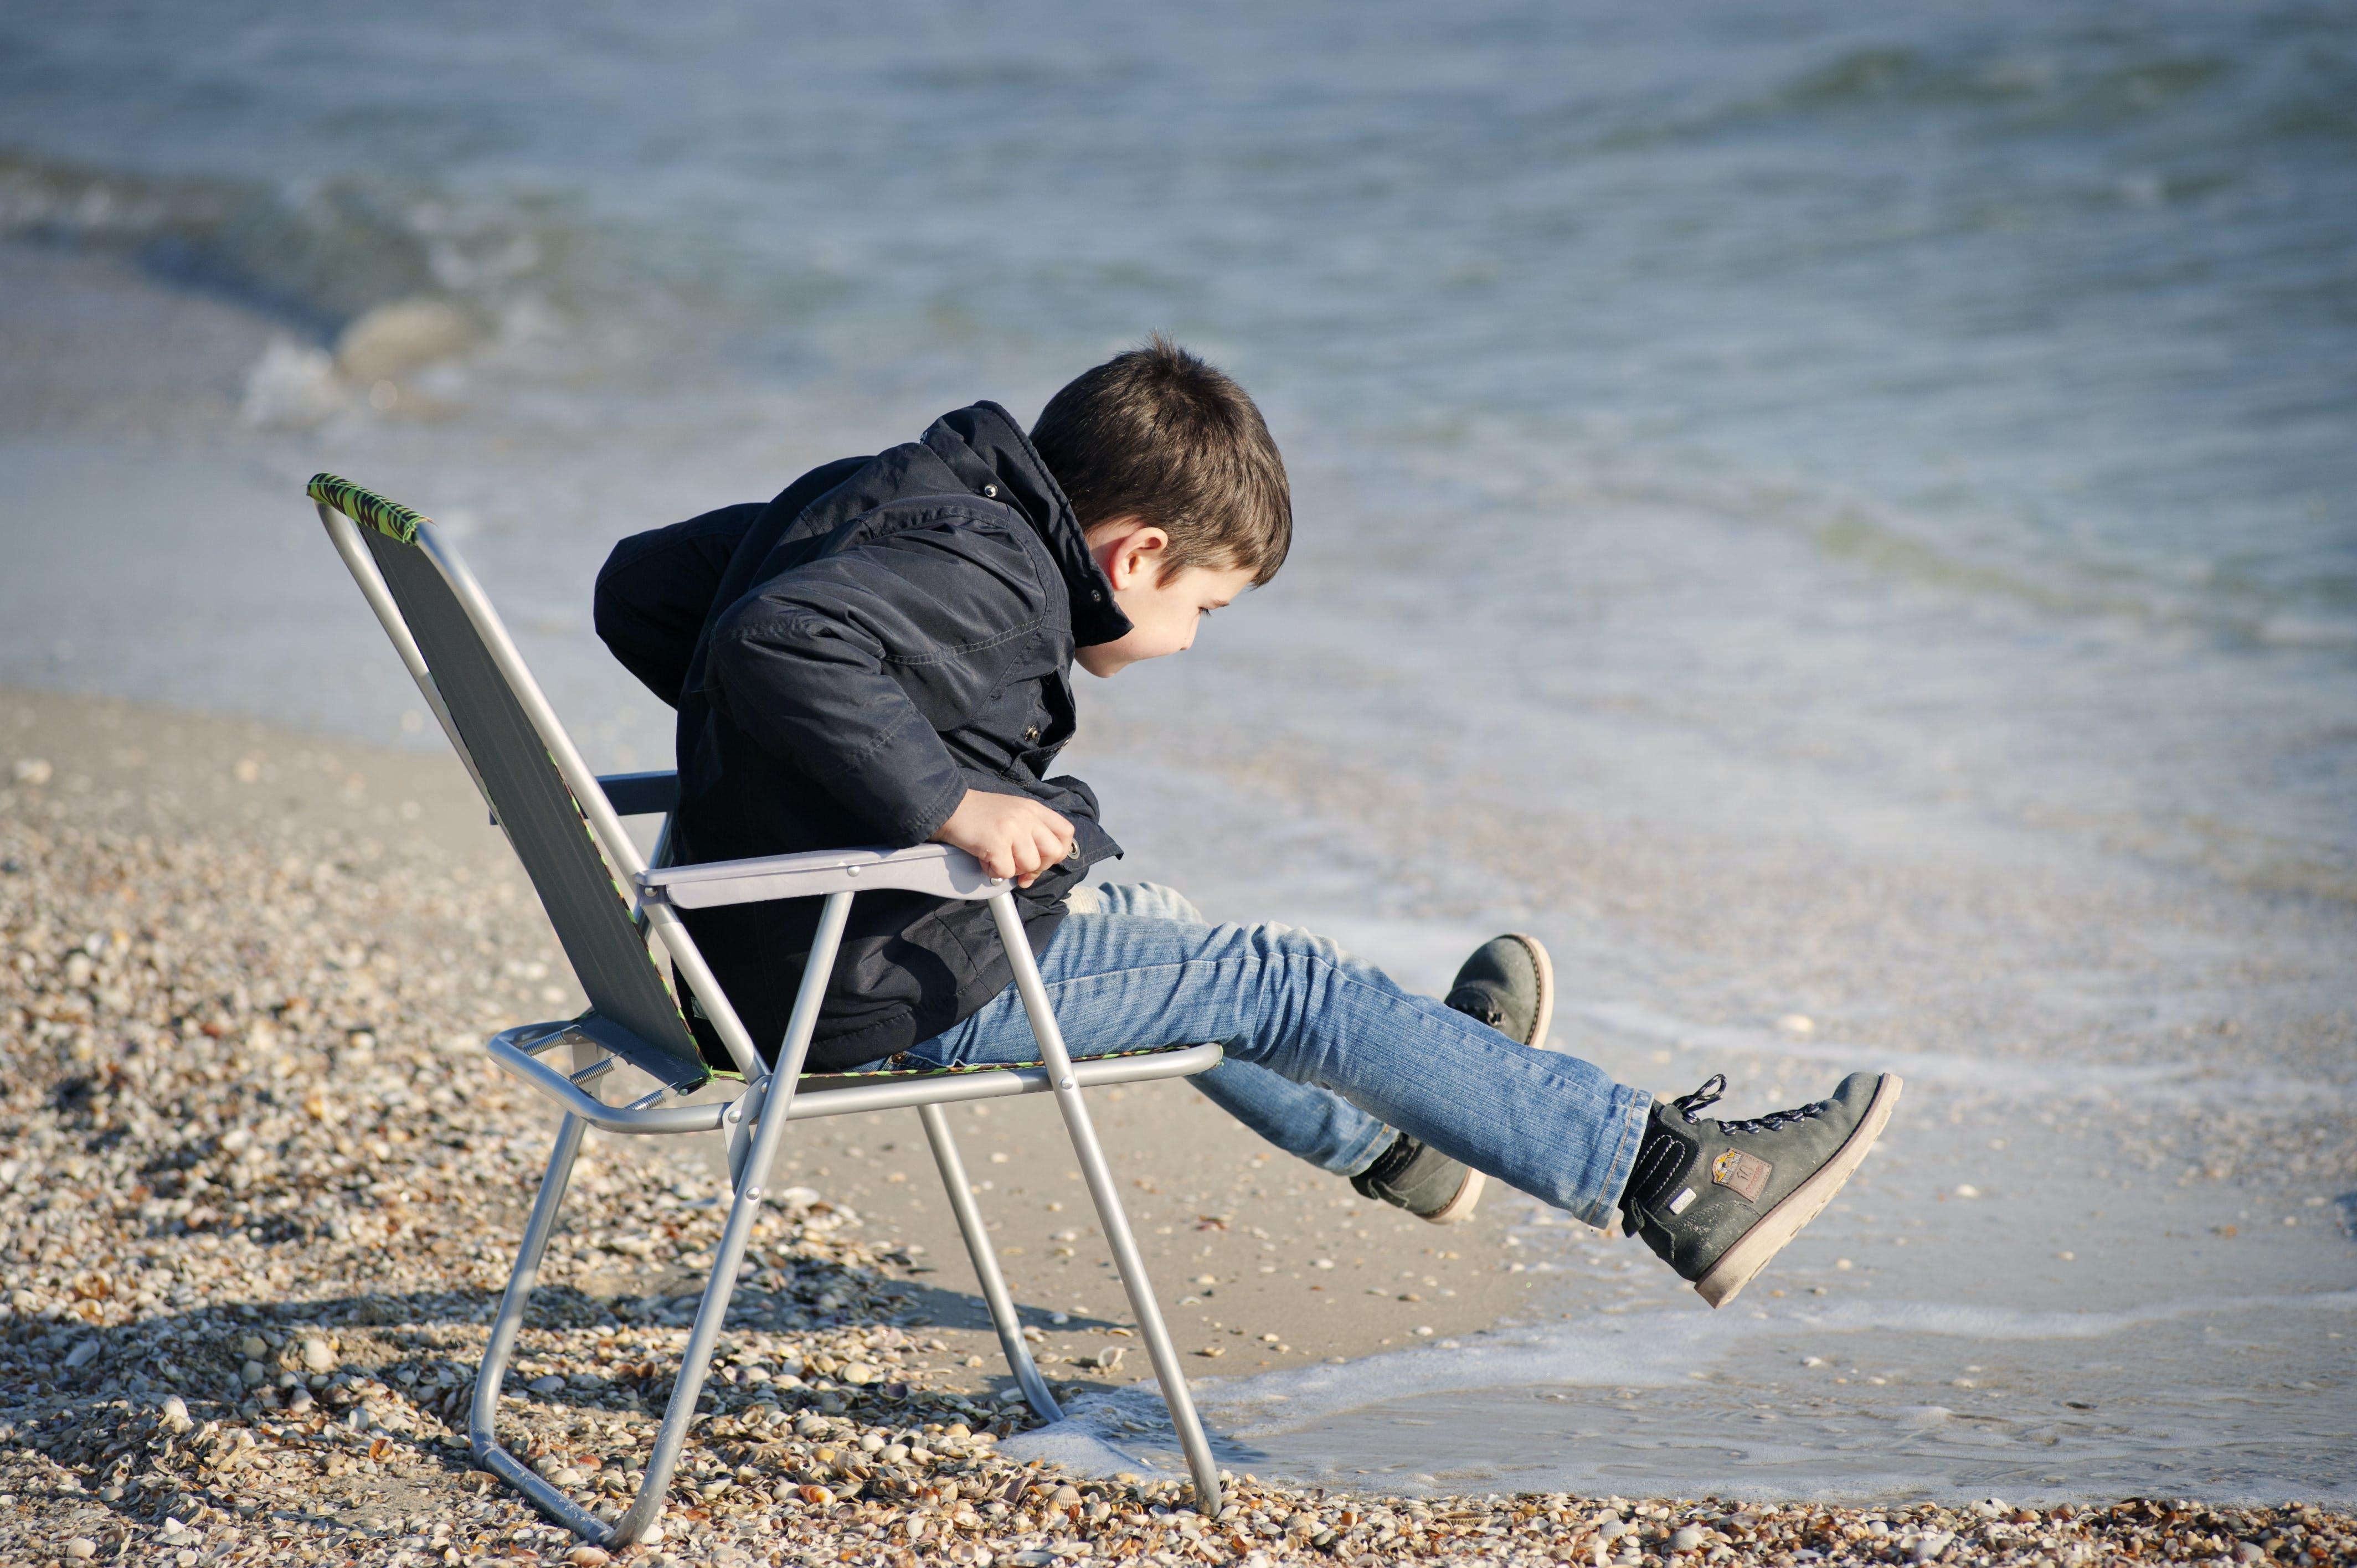 Kostenloses Stock Foto zu entspannung, erholung, jung, junge